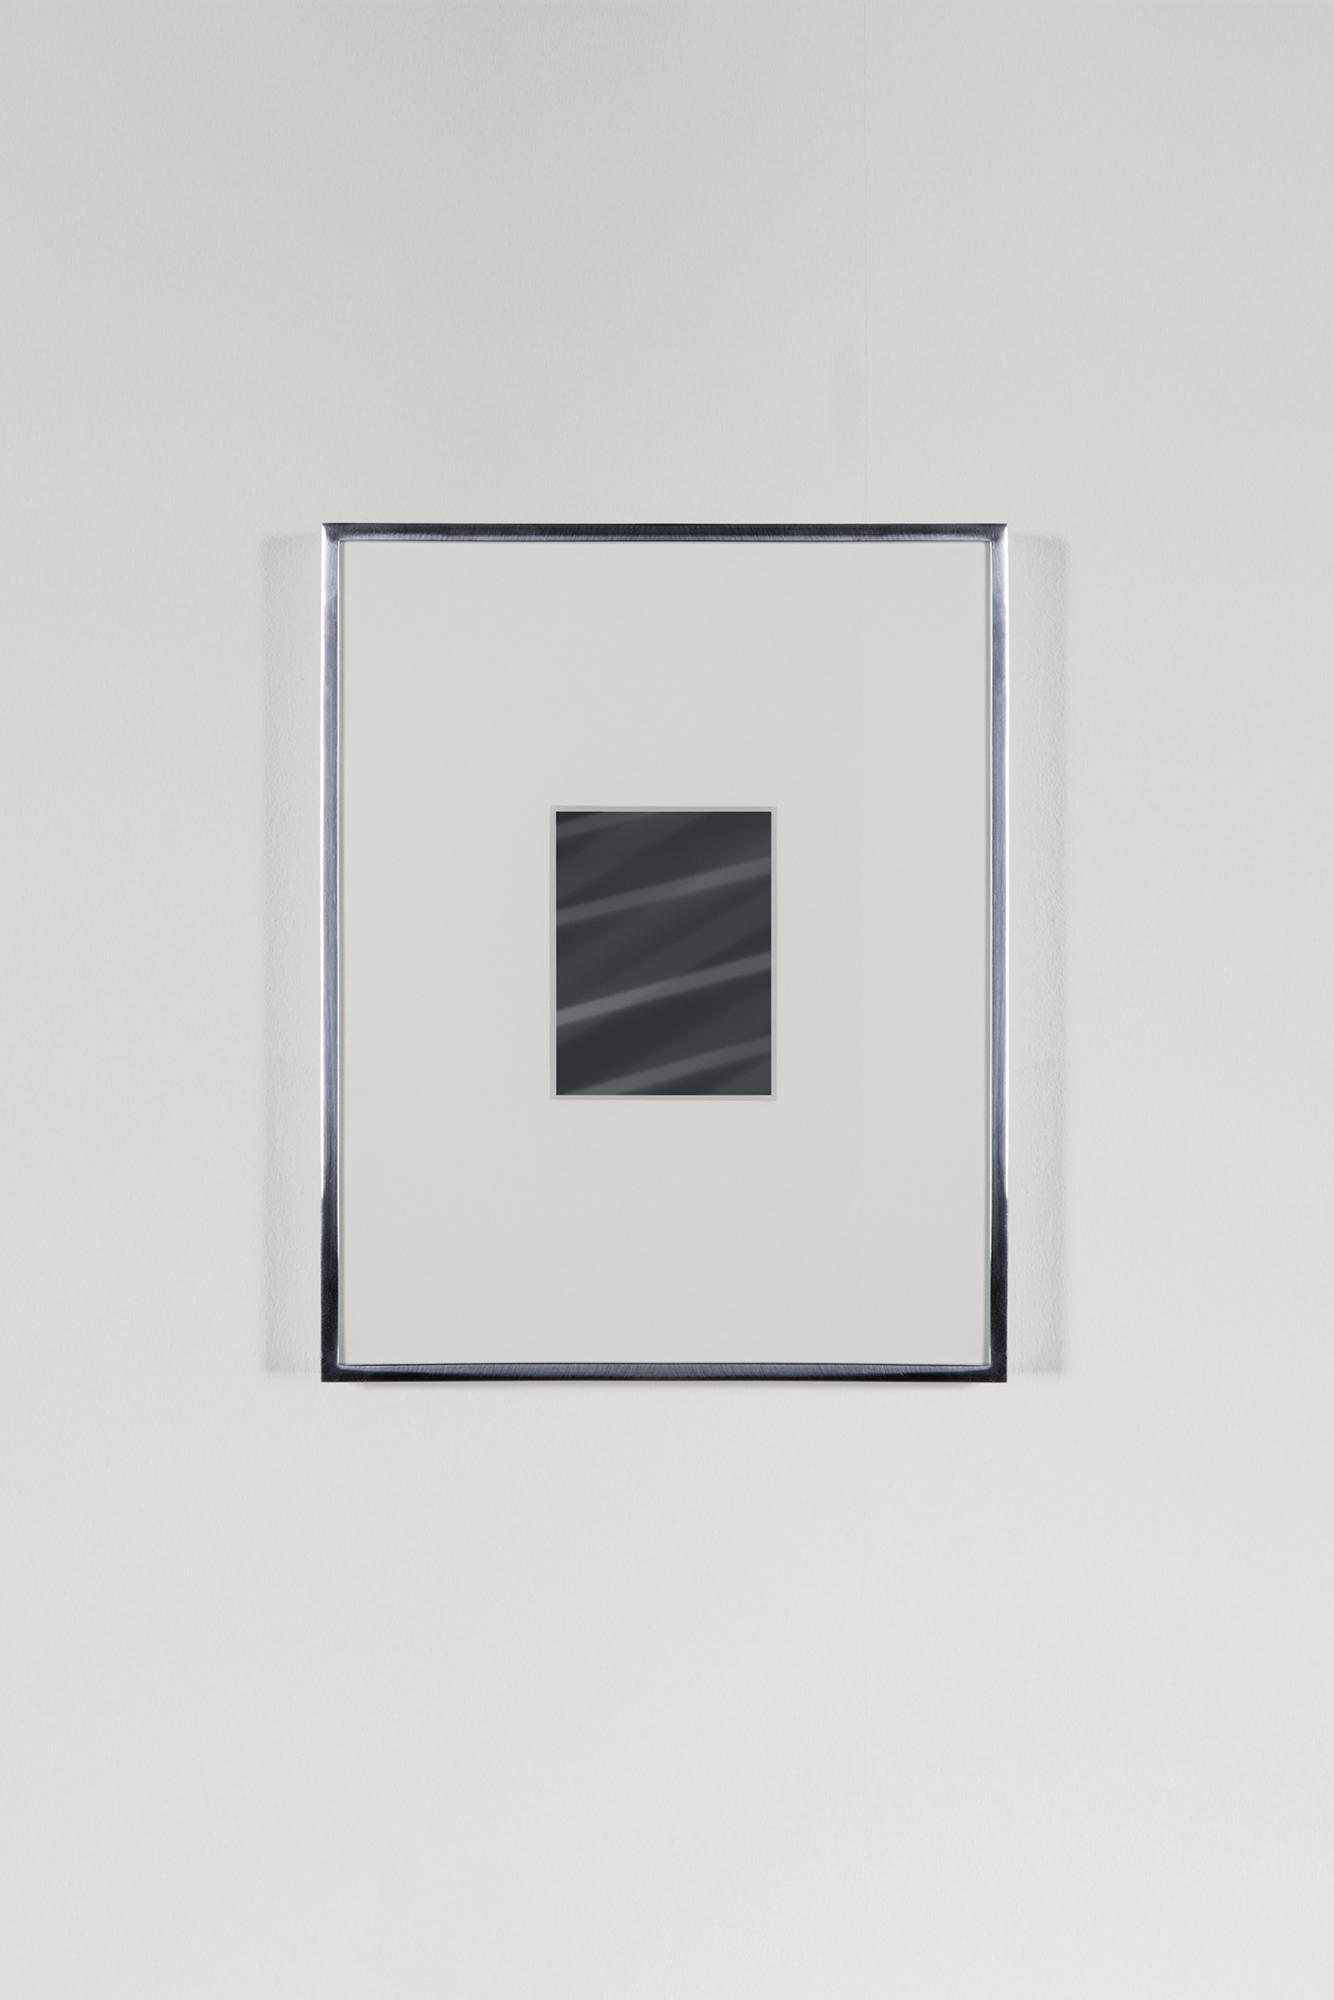 Transparency (Negative) [Kodak Portra 400NC Em. No. 1022: November 20–23, 2015 LAX/IAD/FRA/VCE VCE/FRA/SFO/LAX]    2017   Epson Ultrachrome K3 archival ink jet print on Museo Silver Rag Paper  14 x 11 inches   Transparencies, 2014–